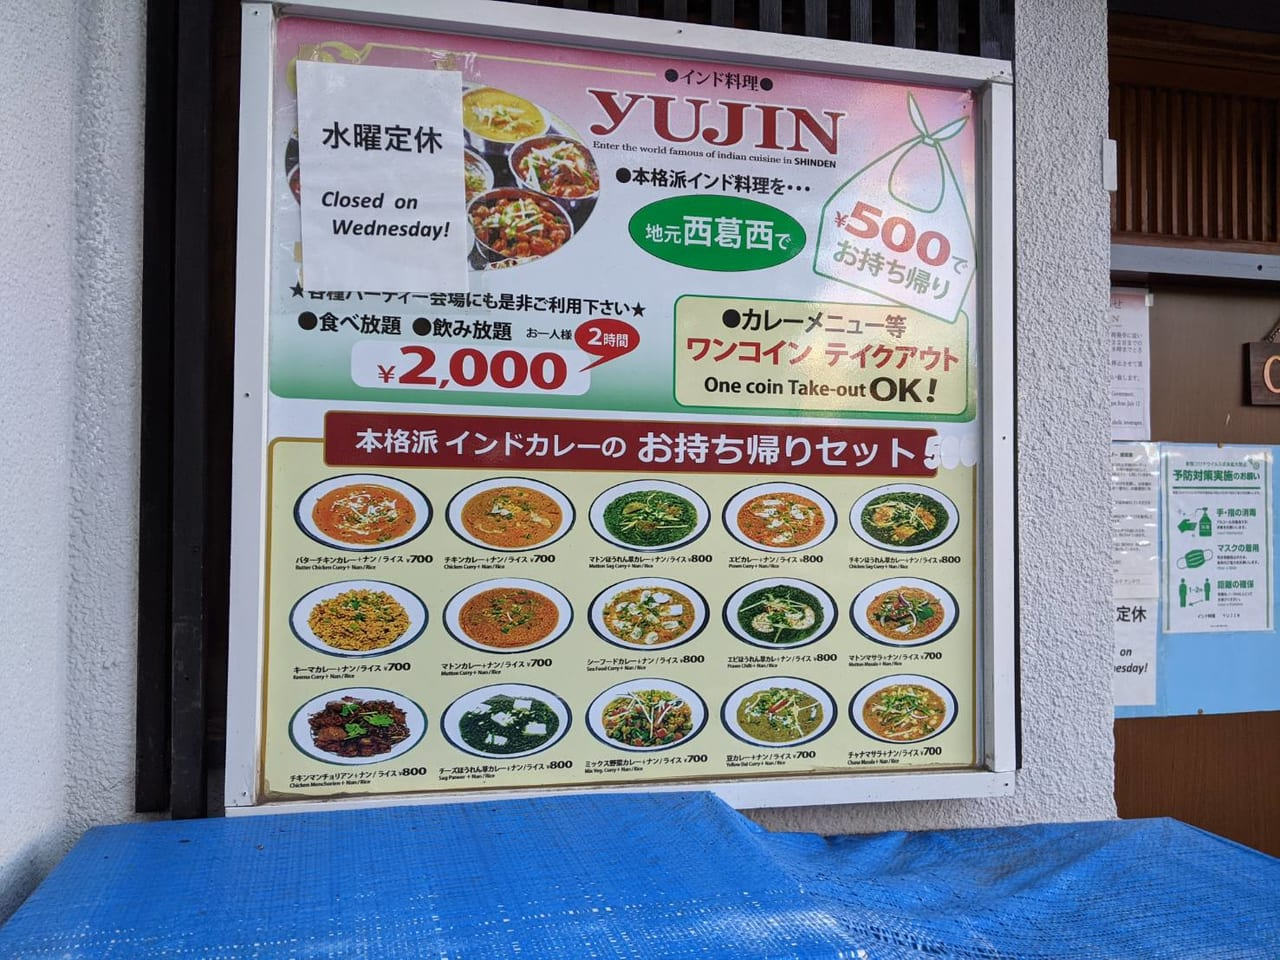 「yujin」テイクアウトメニュー